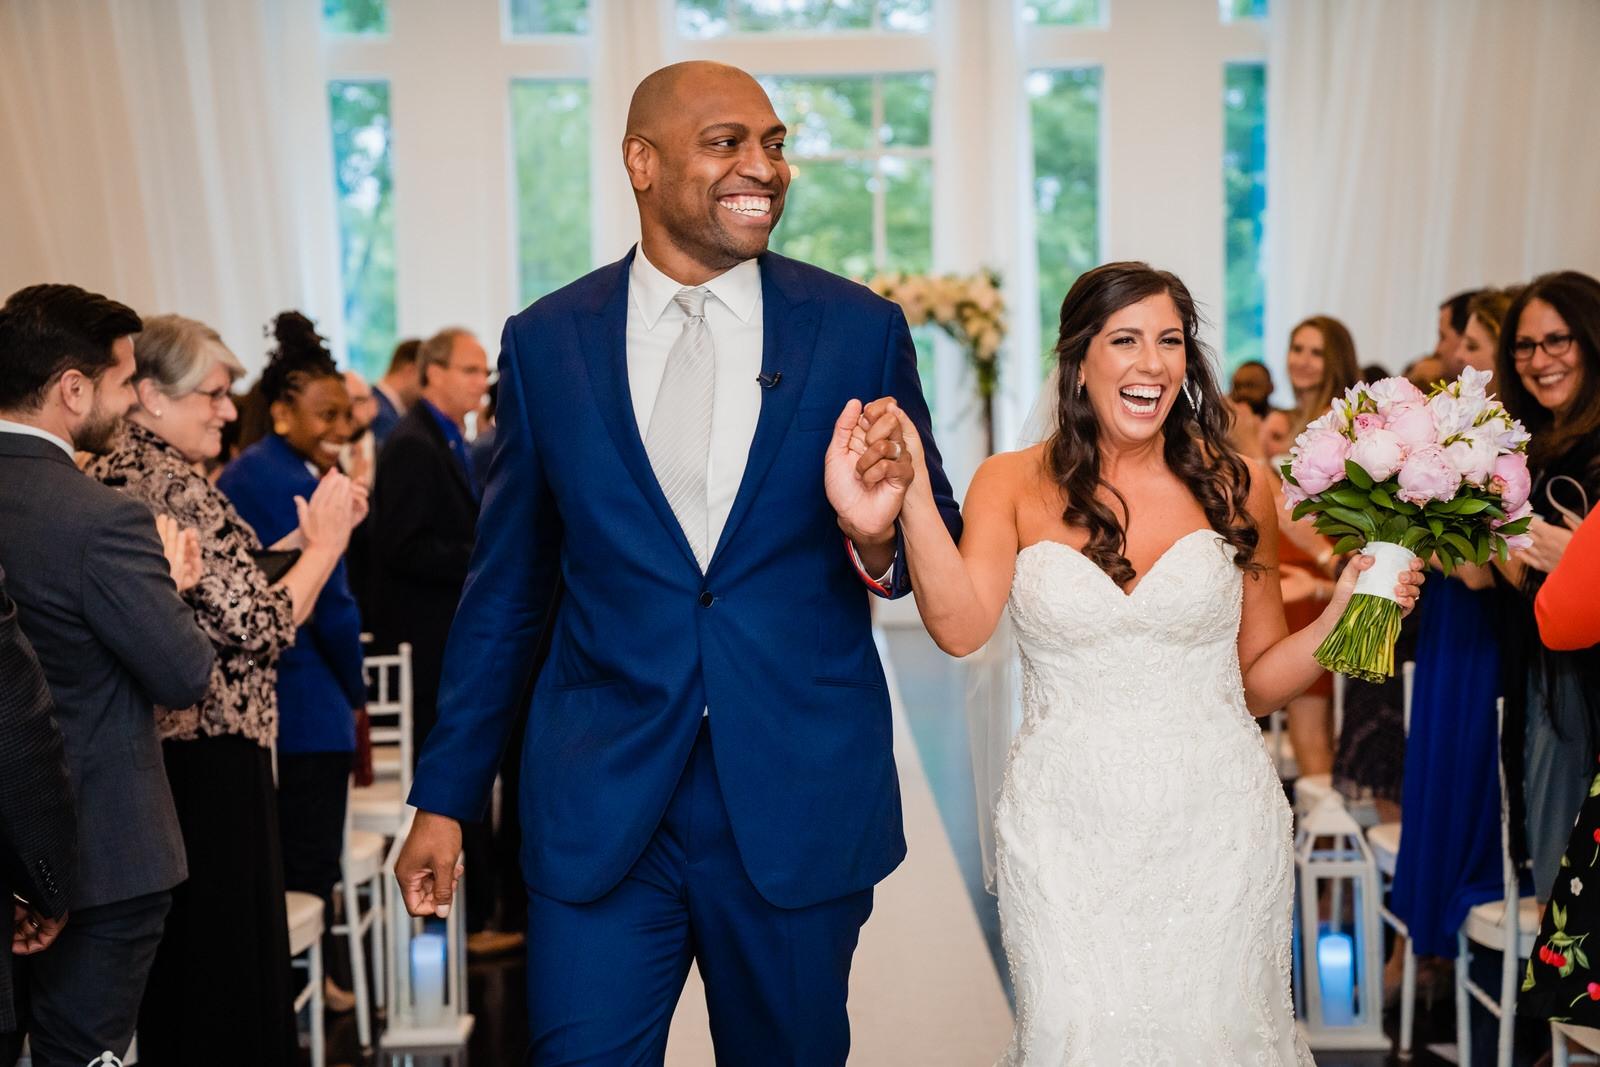 Ally-Jason-Lakeview-Pavilion-Foxborough-Massachusetts-wedding-photographer-nicole-chan-0011